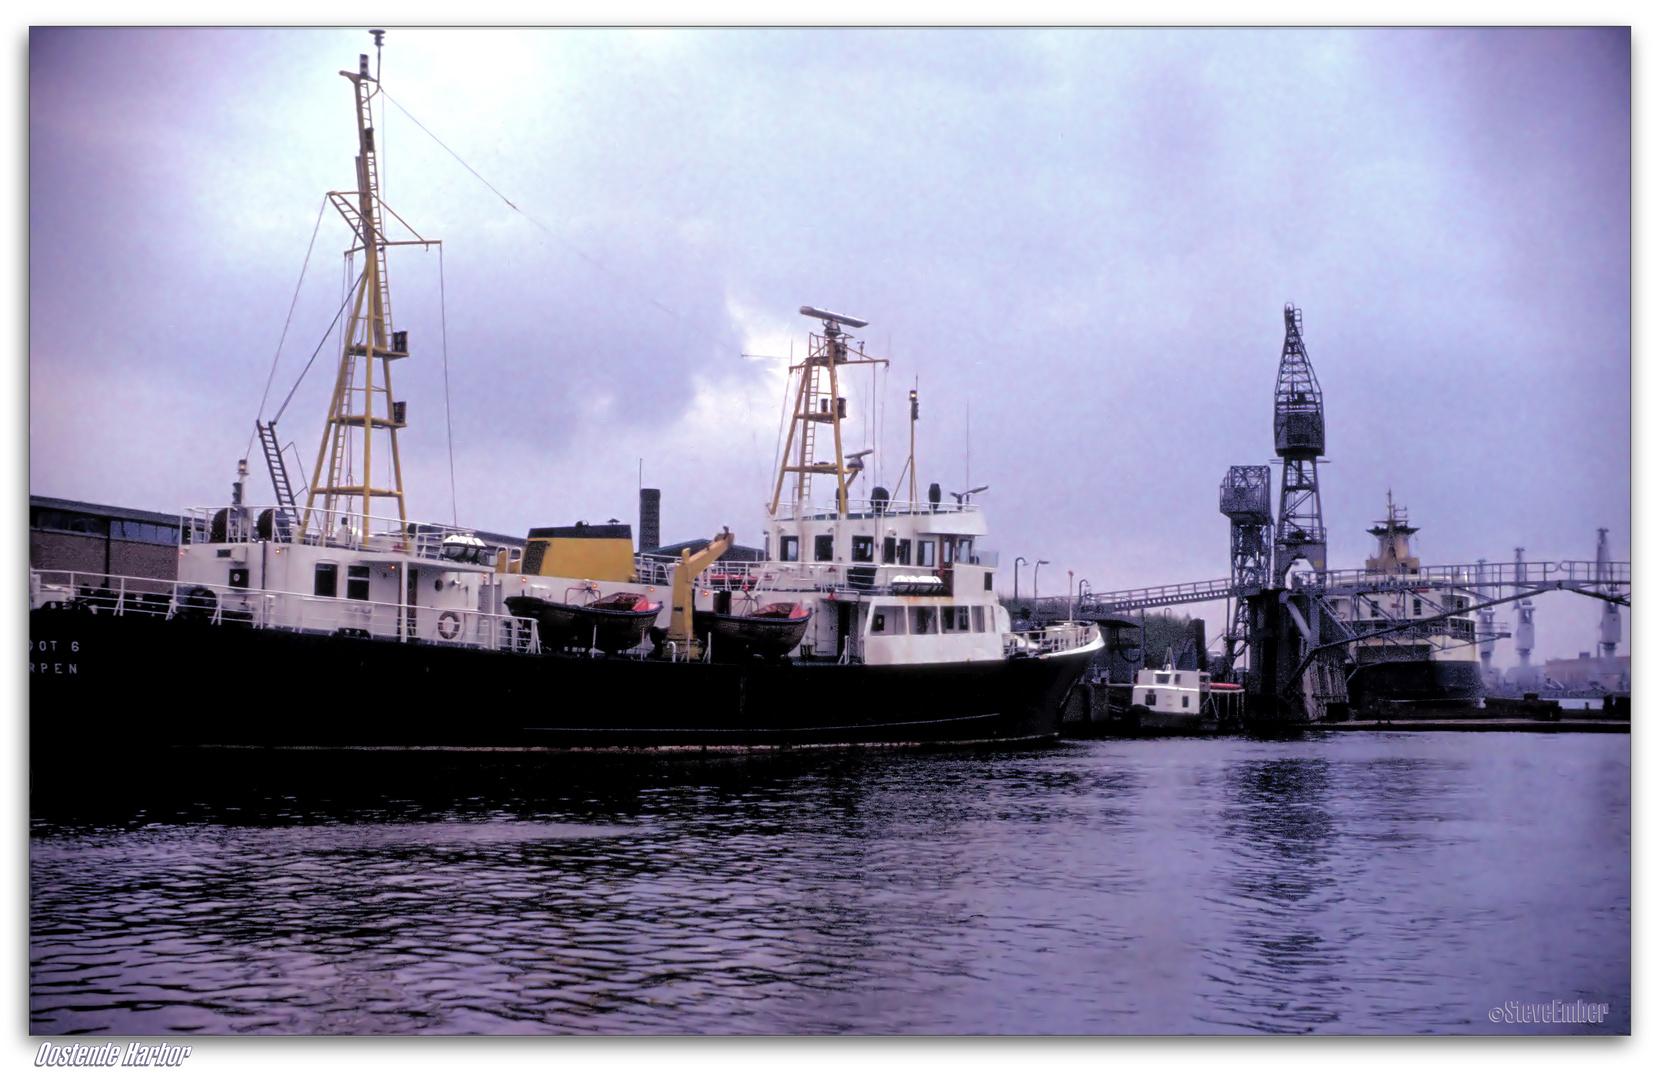 Oostende Harbor